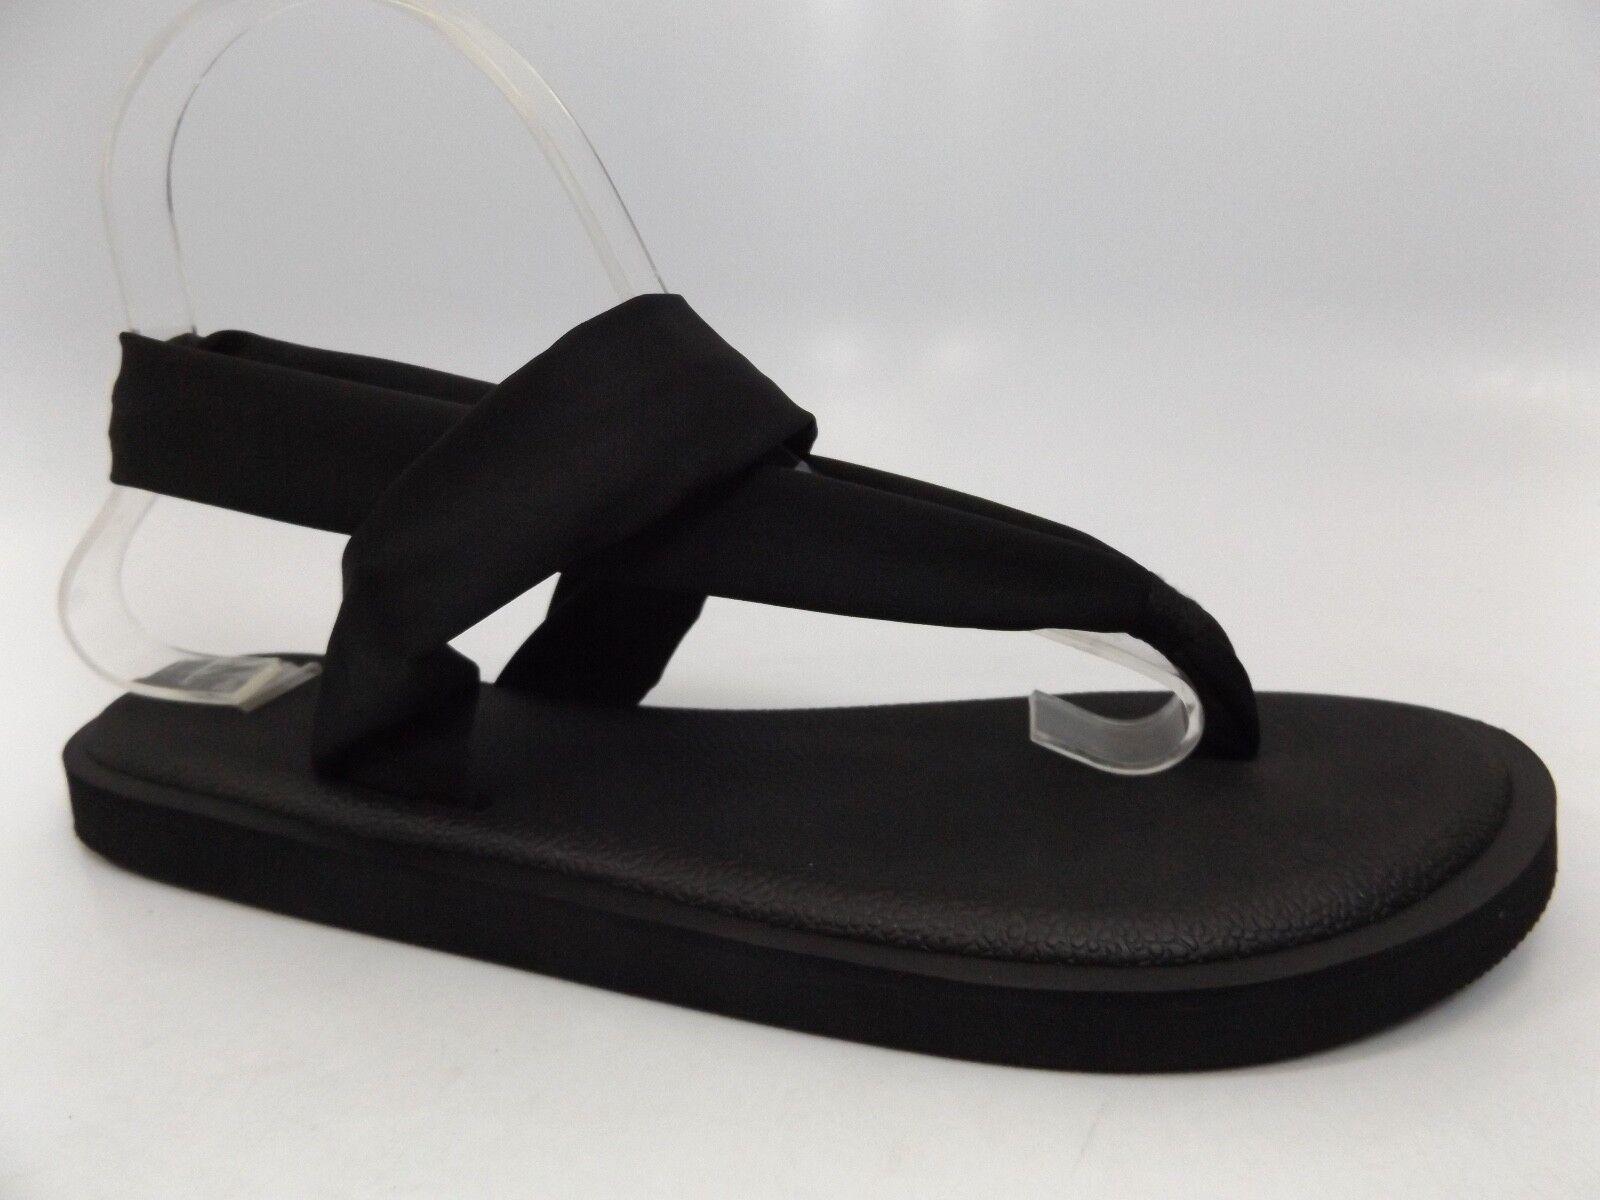 Women Flip Flops Yoga Shoes Thong Flat NEW Sandals SZ 10.0 M NEW Flat DISPLAY D7463 084daf